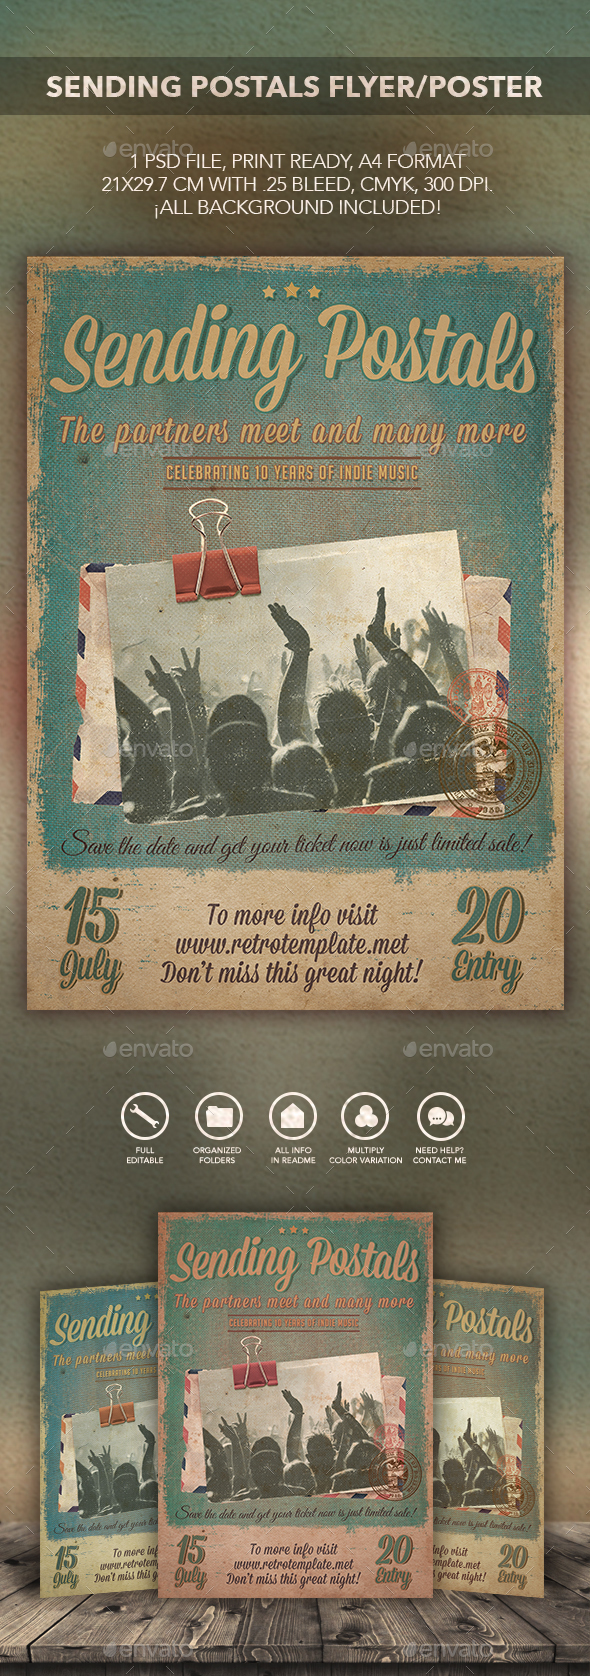 Sending Postals Flyer Poster - Events Flyers